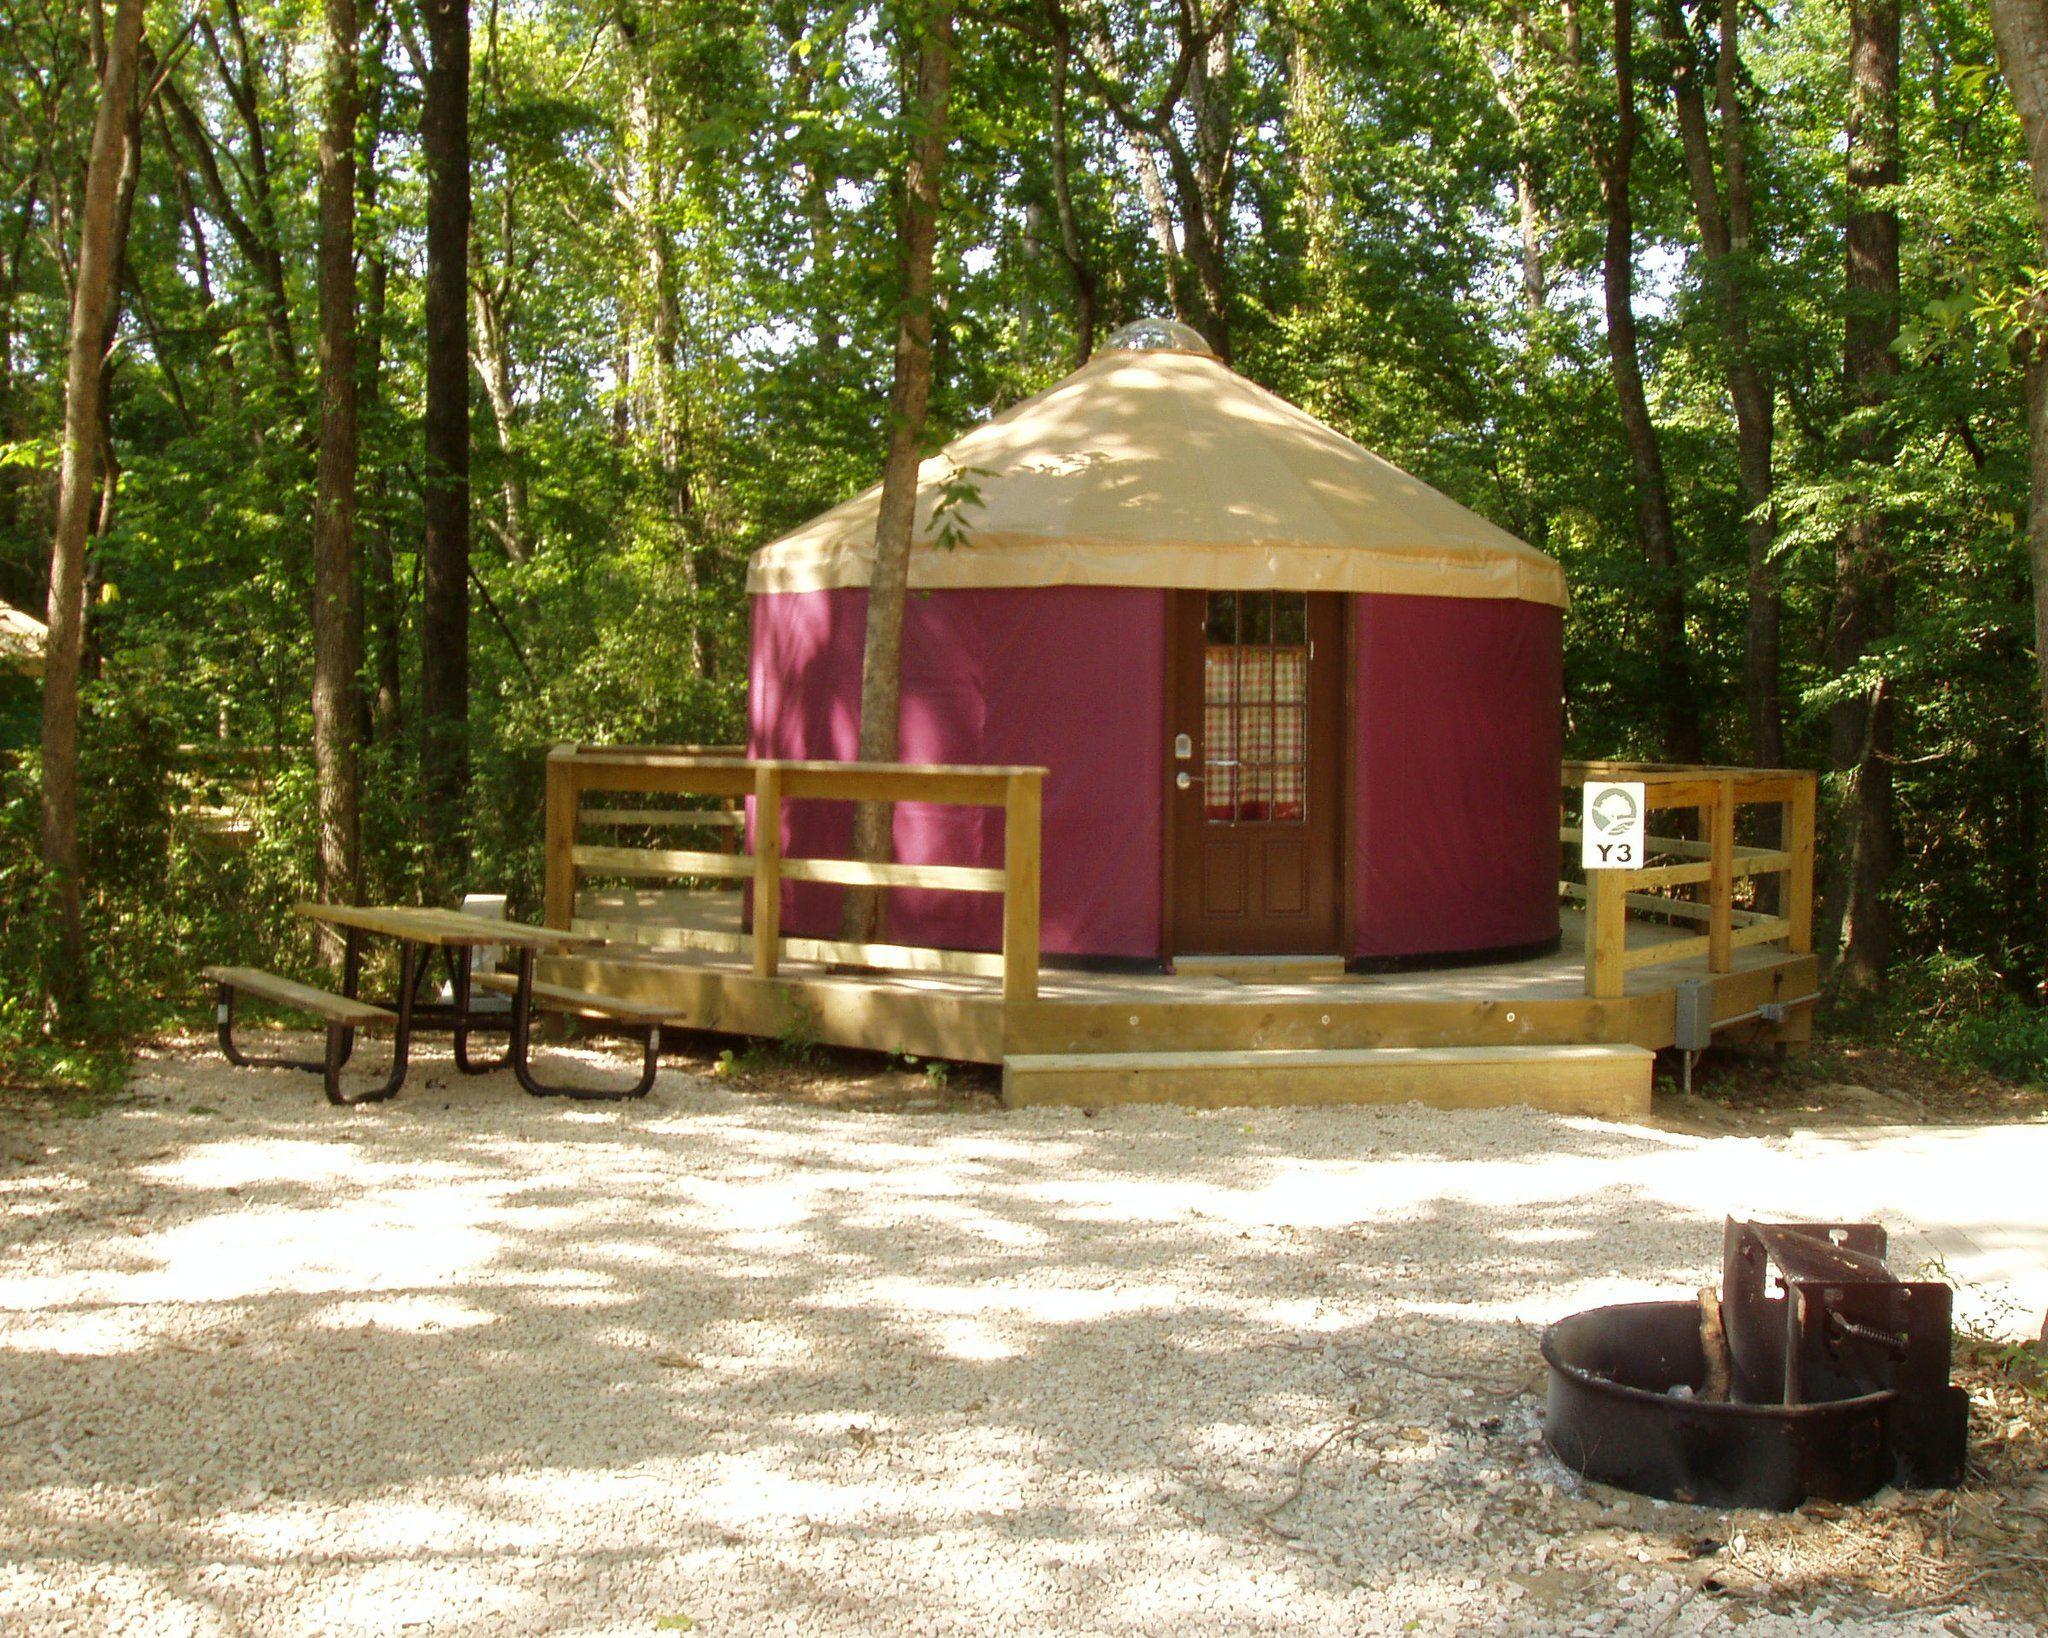 Yurt Yurt Yurt These Are Awesome Hot Springs Arkansas